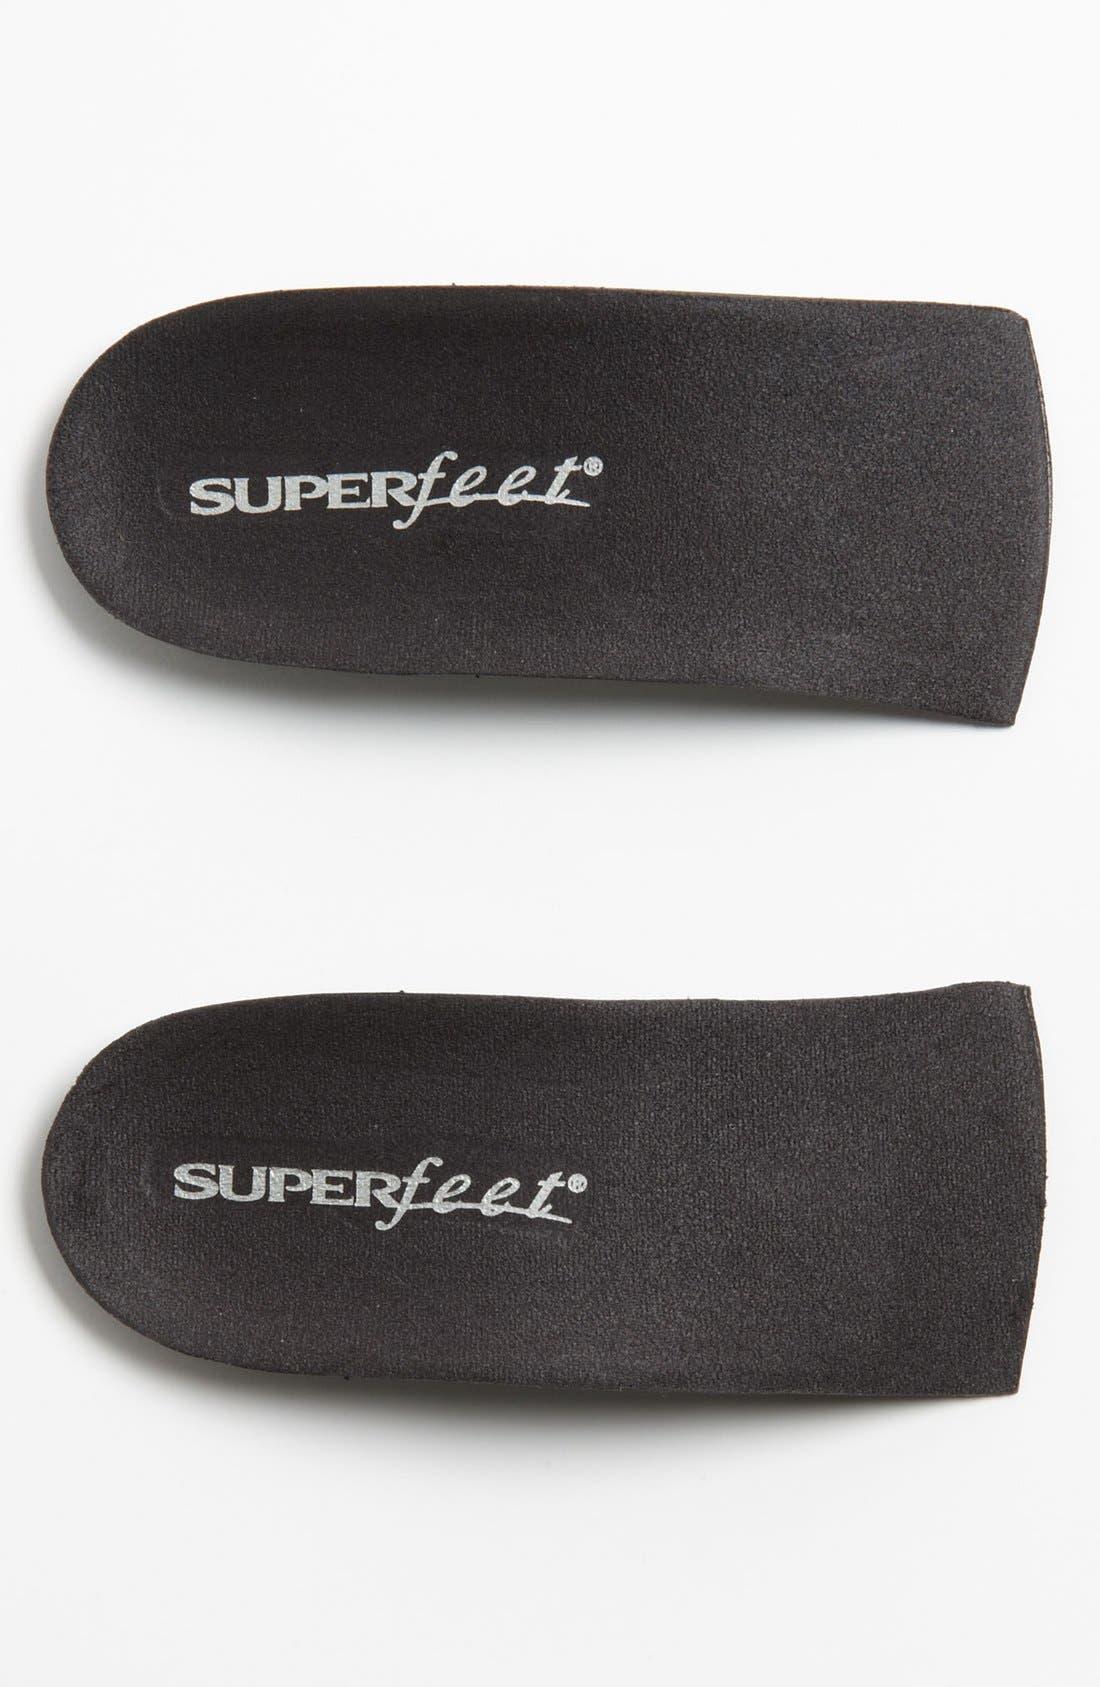 Main Image - Superfeet 'Delux' High Heel Three-Quarter Insoles